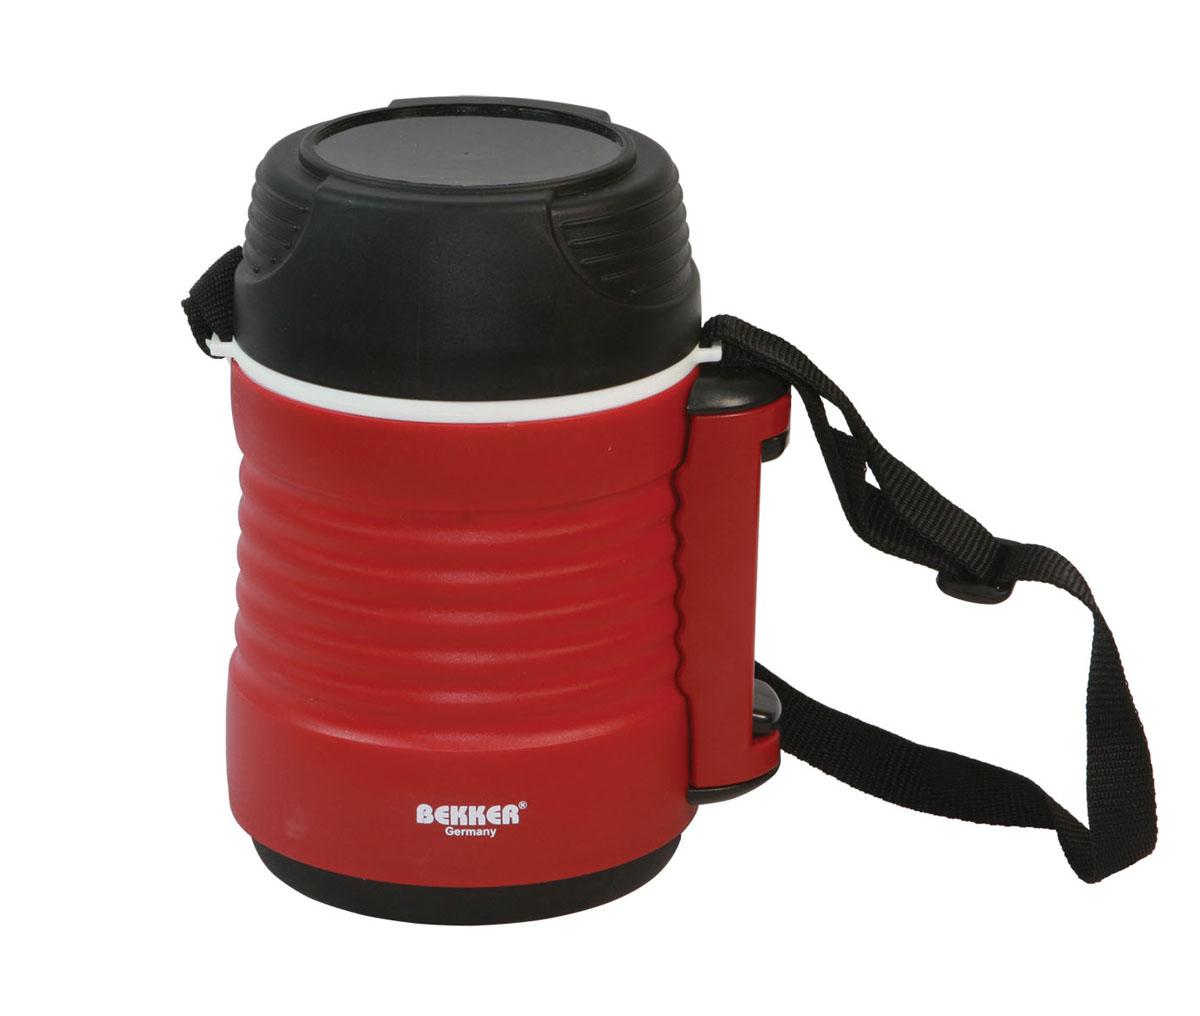 термоконтейнер bekker термоконтейнер Термоконтейнер Bekker, цвет: красный, 1,2 л